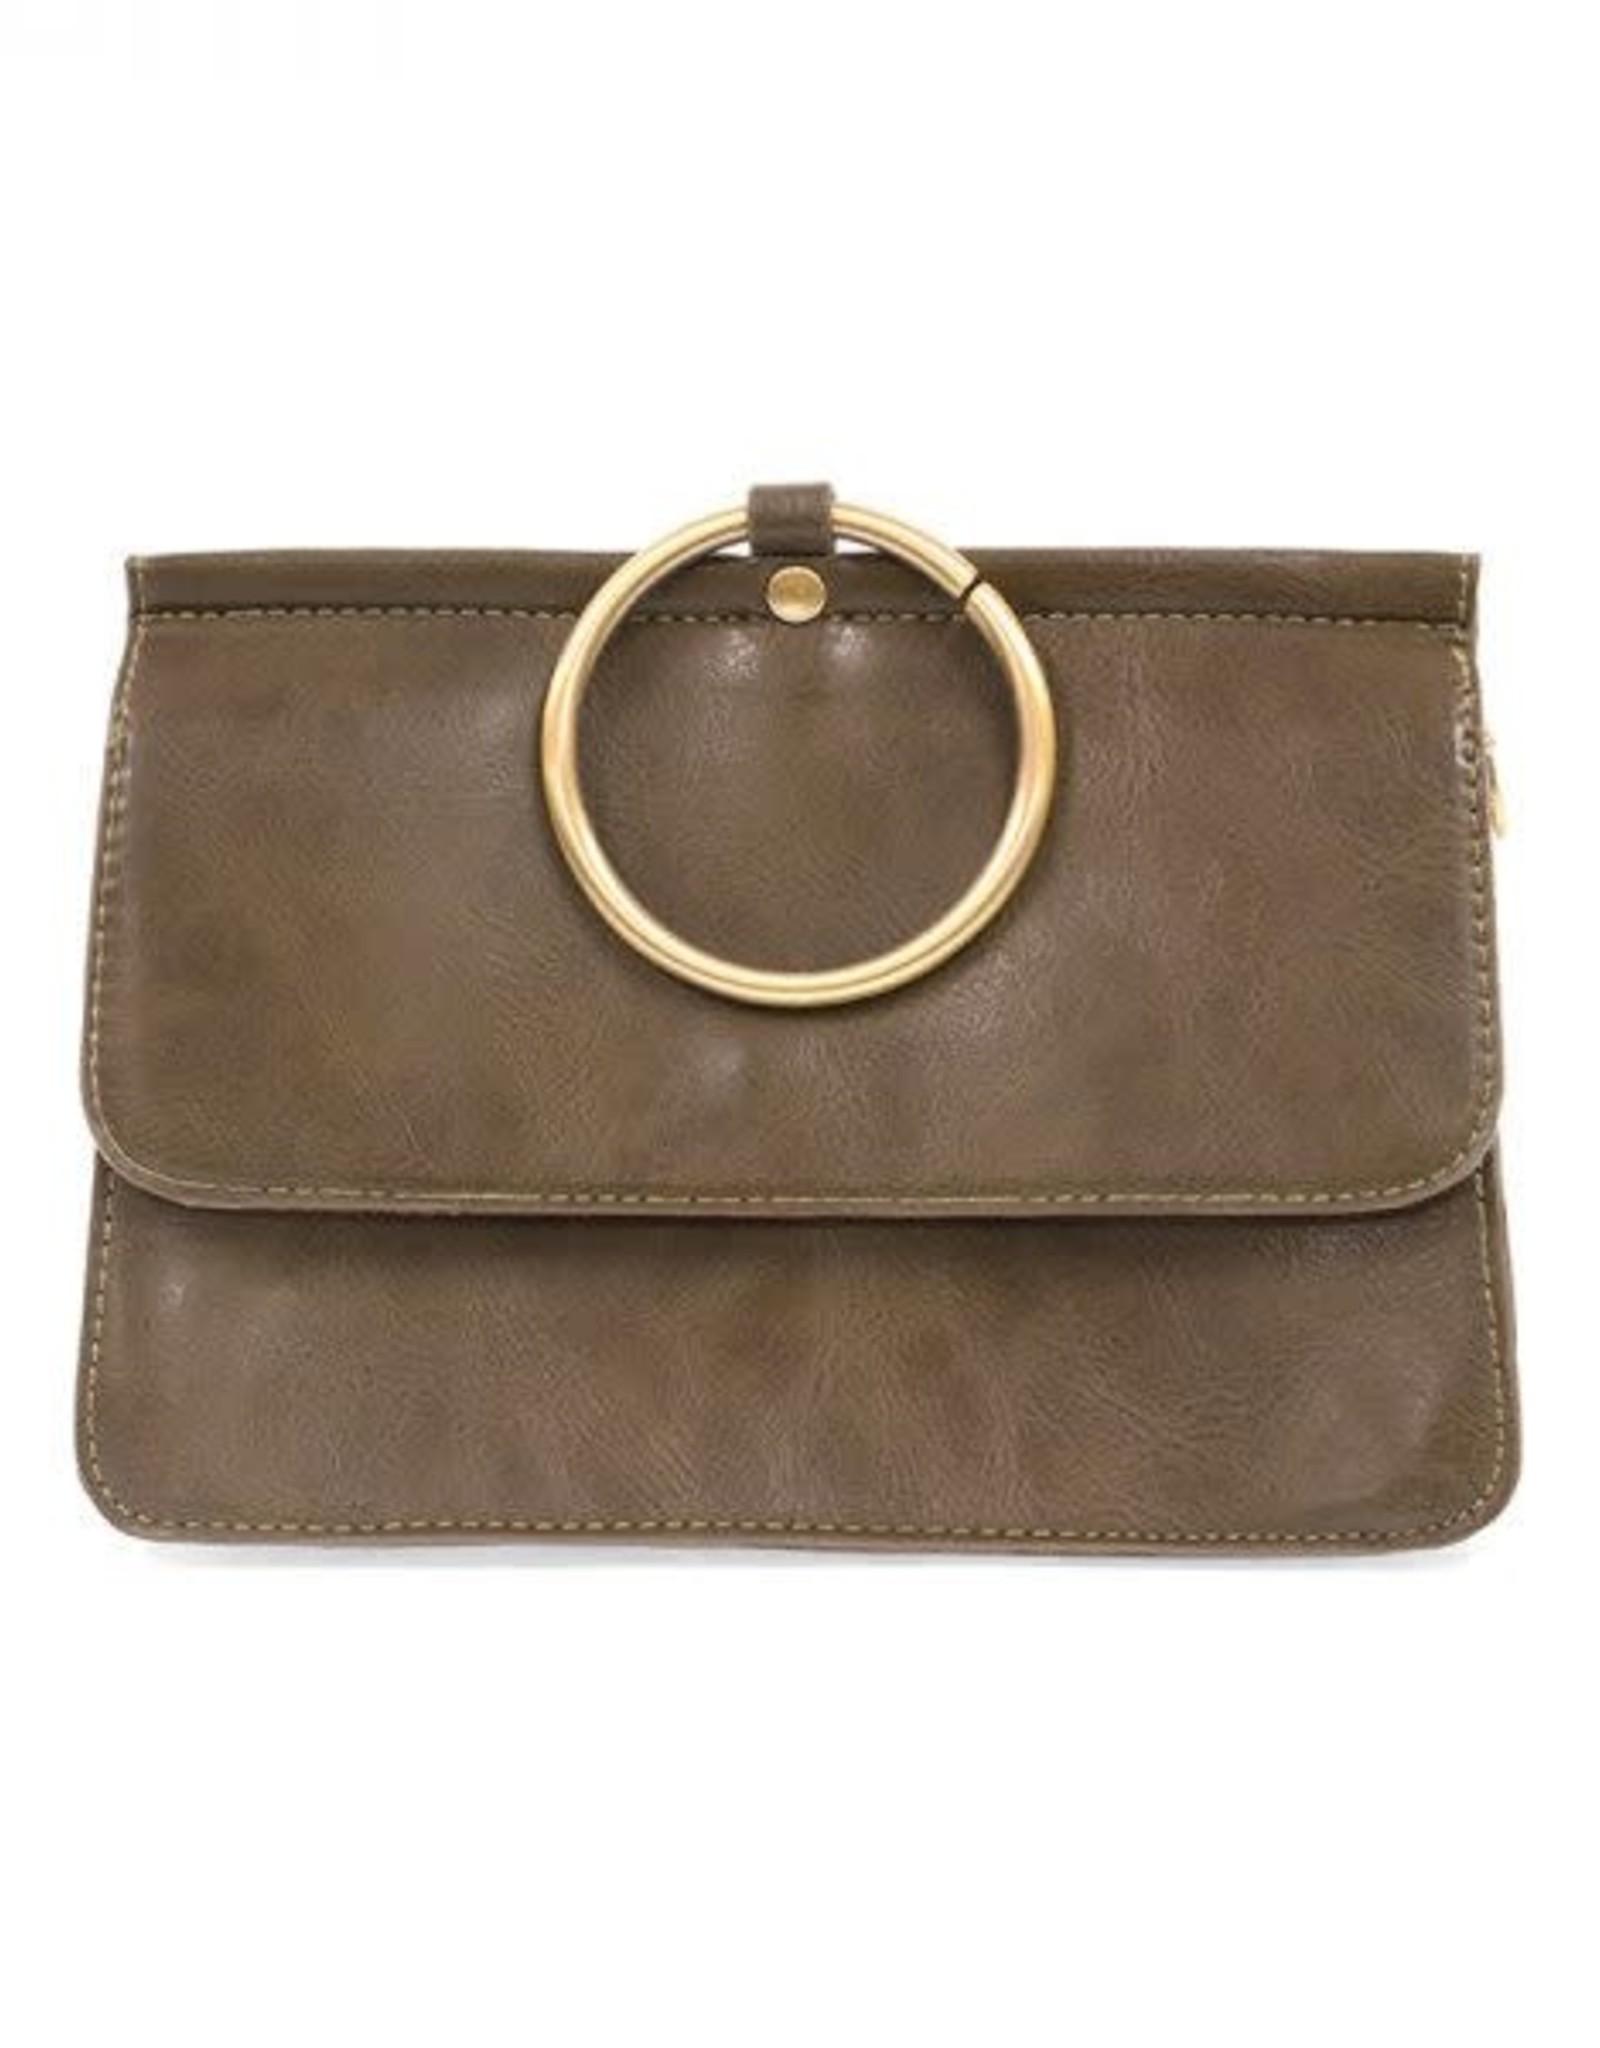 Joy Susan Accessories Aria Ring Bag